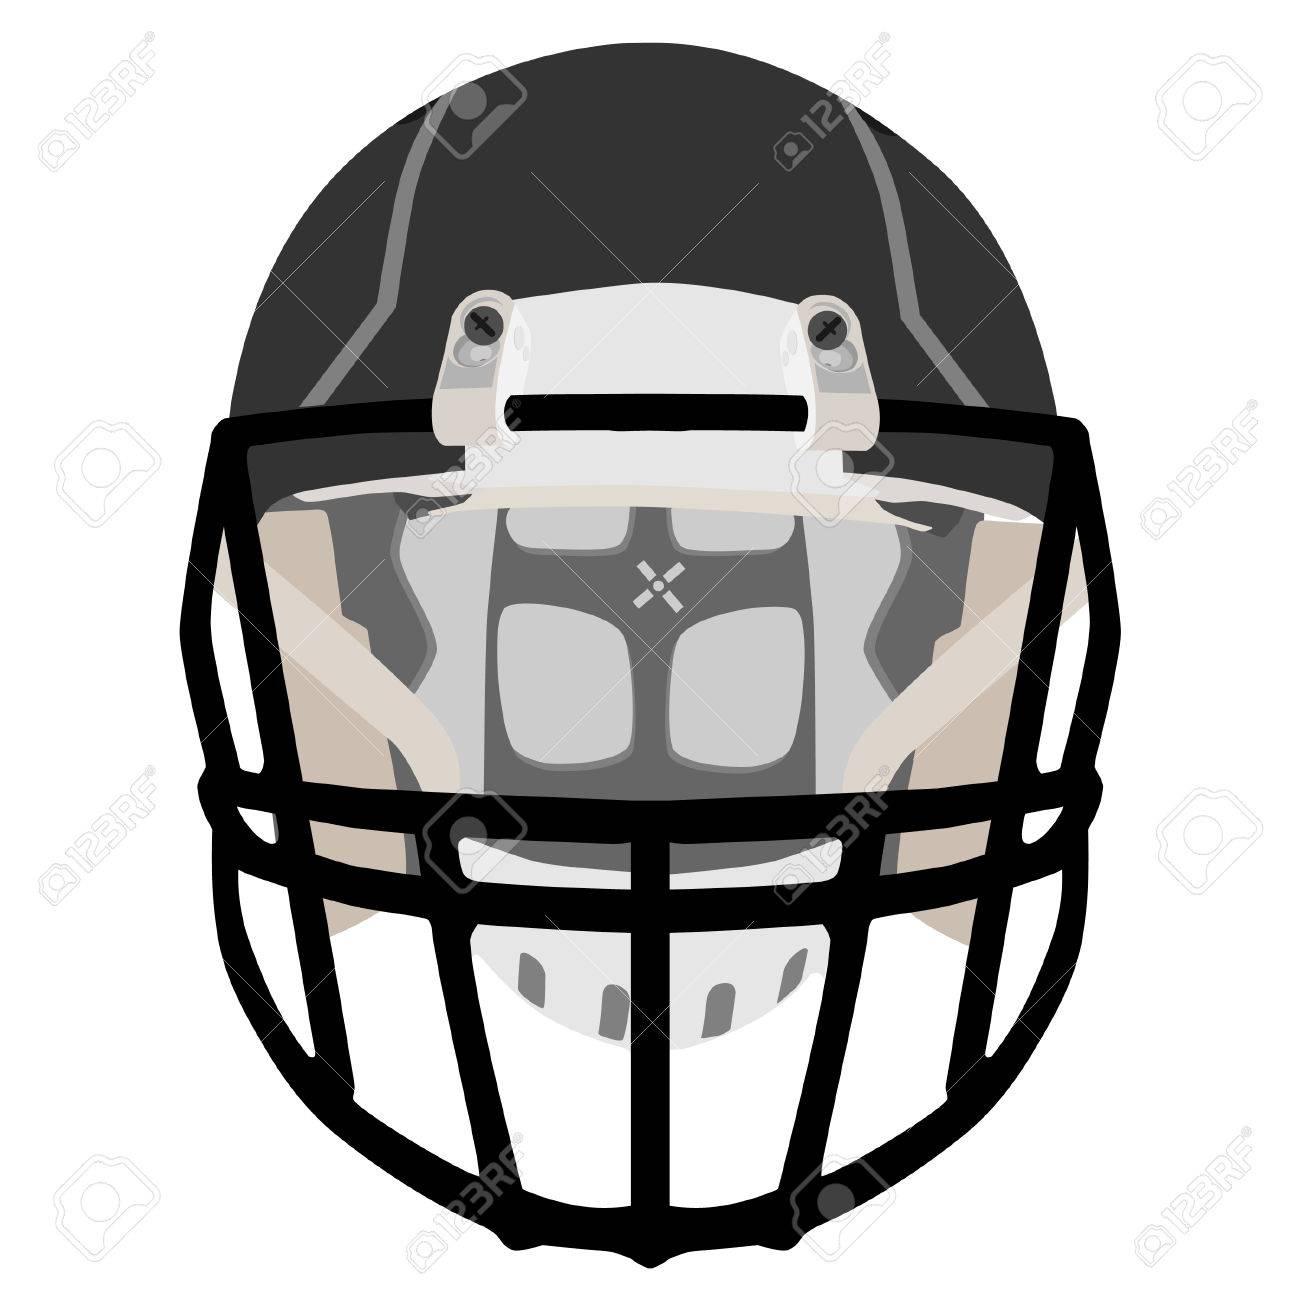 Black American Football Helmet Sport Equipment Outfit Vector